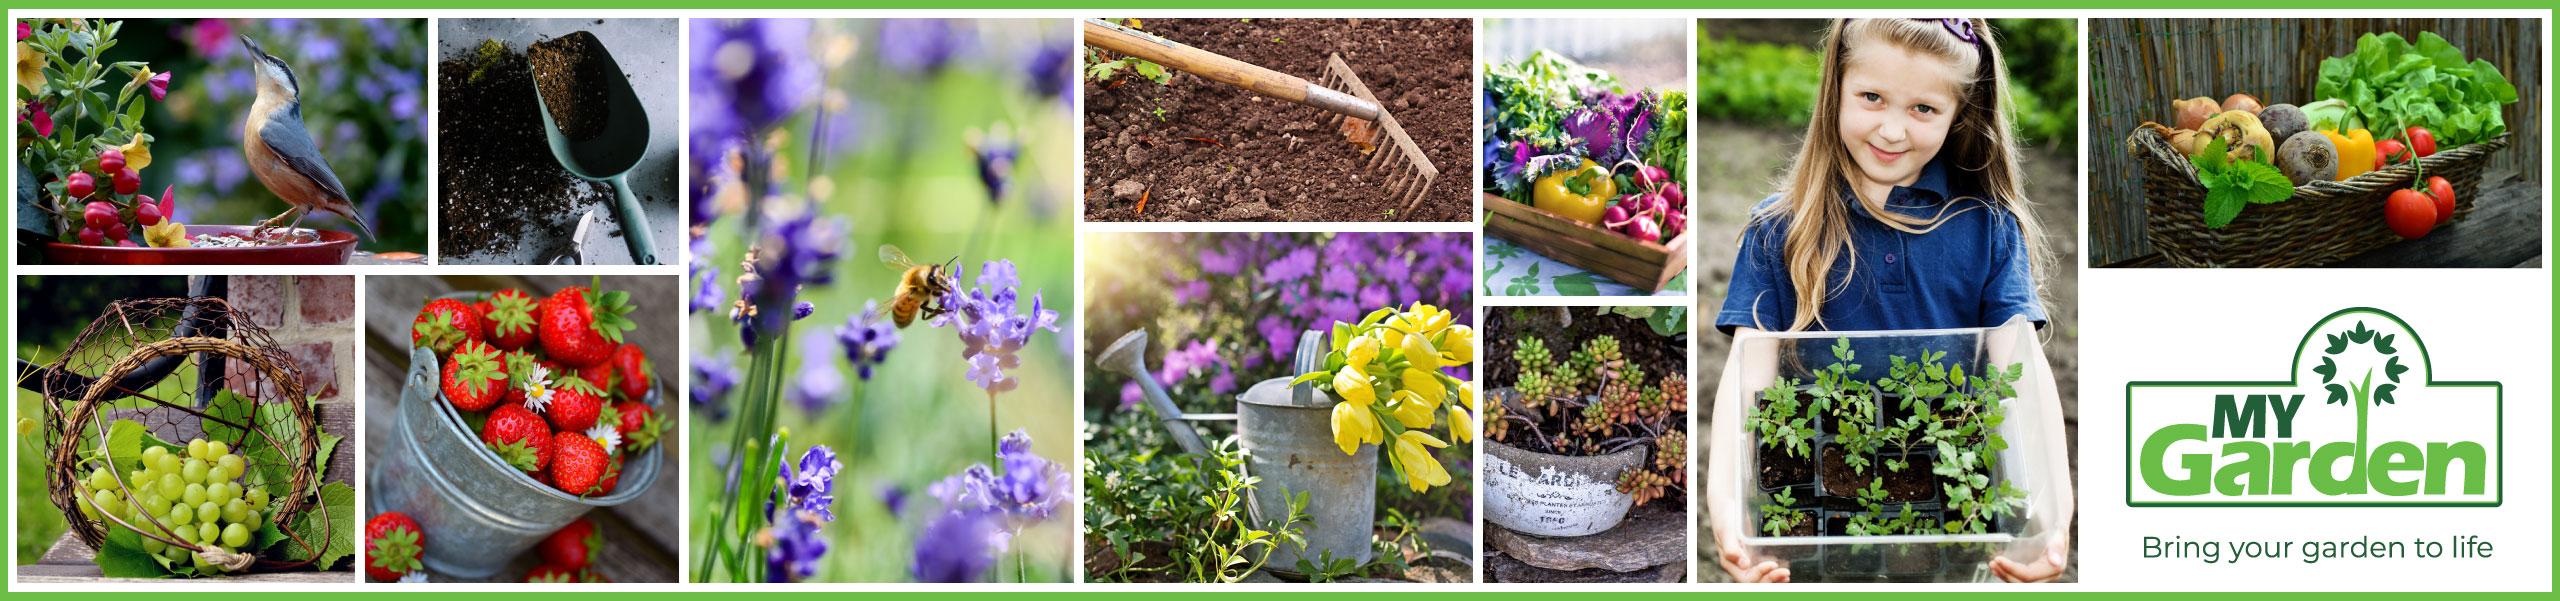 My Garden | Prices Plus